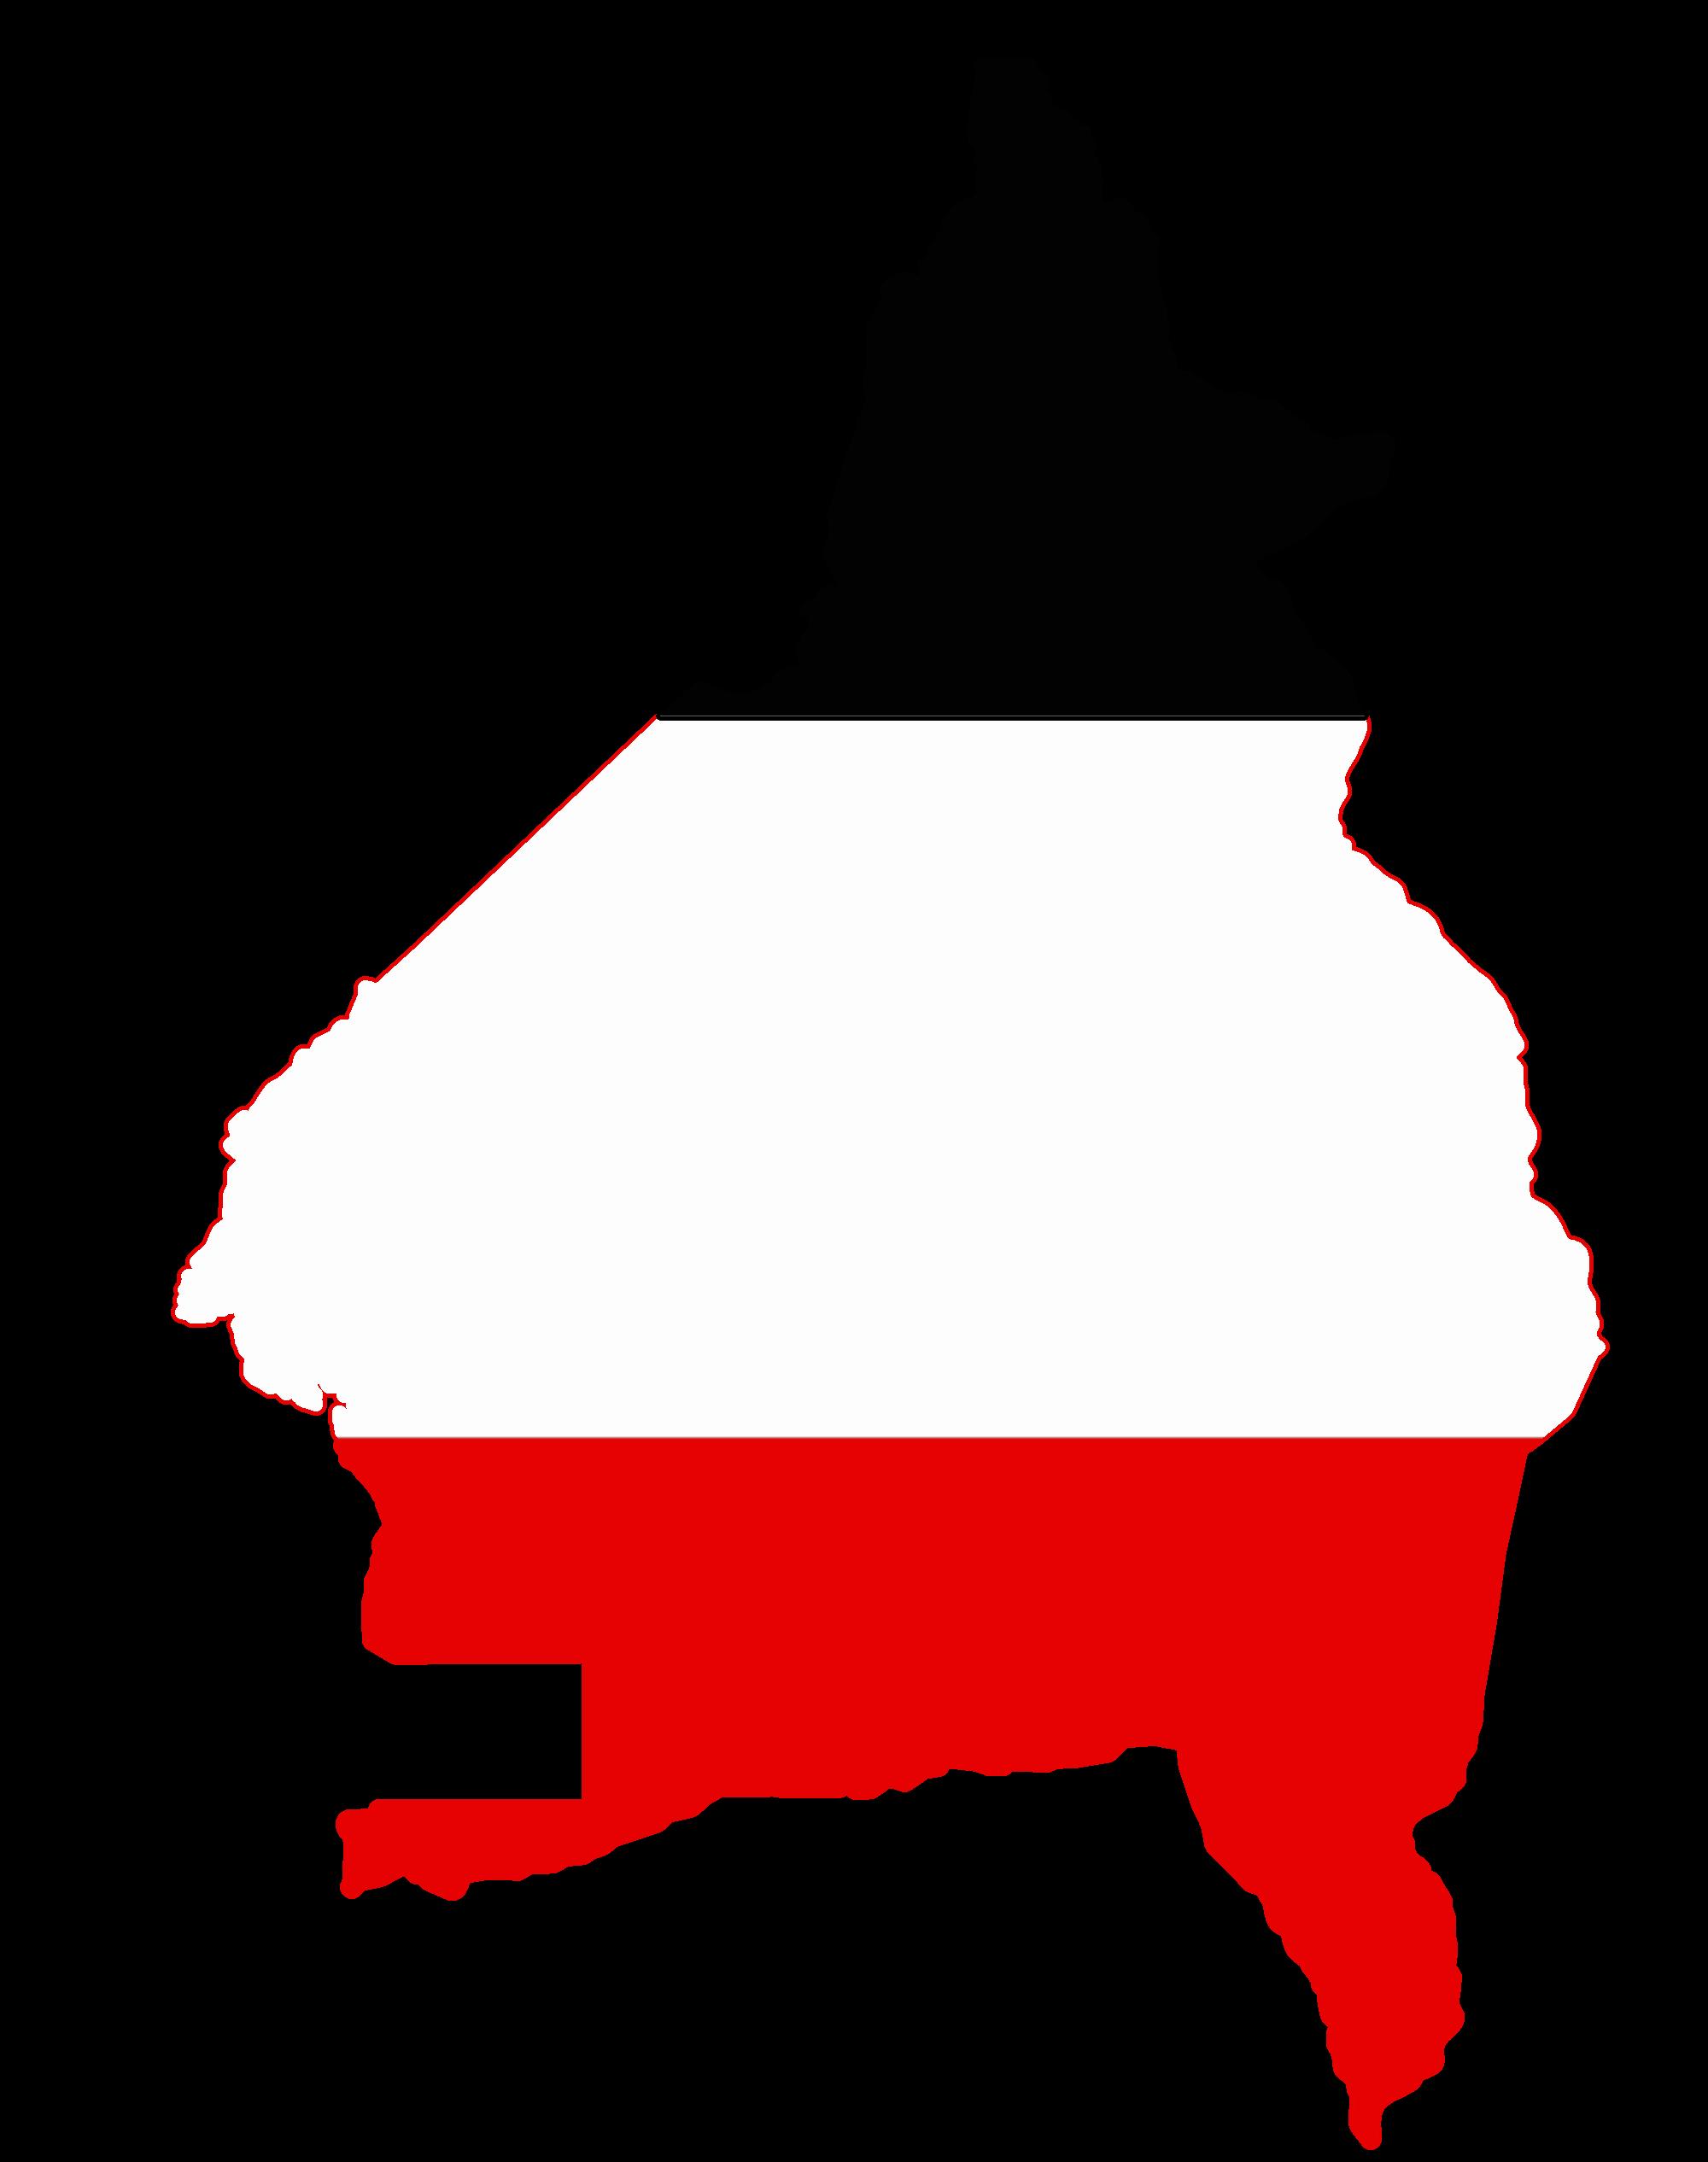 File:Flag Map of German Kamerun (Cameroon) (1884- 1919). - Cameroon PNG